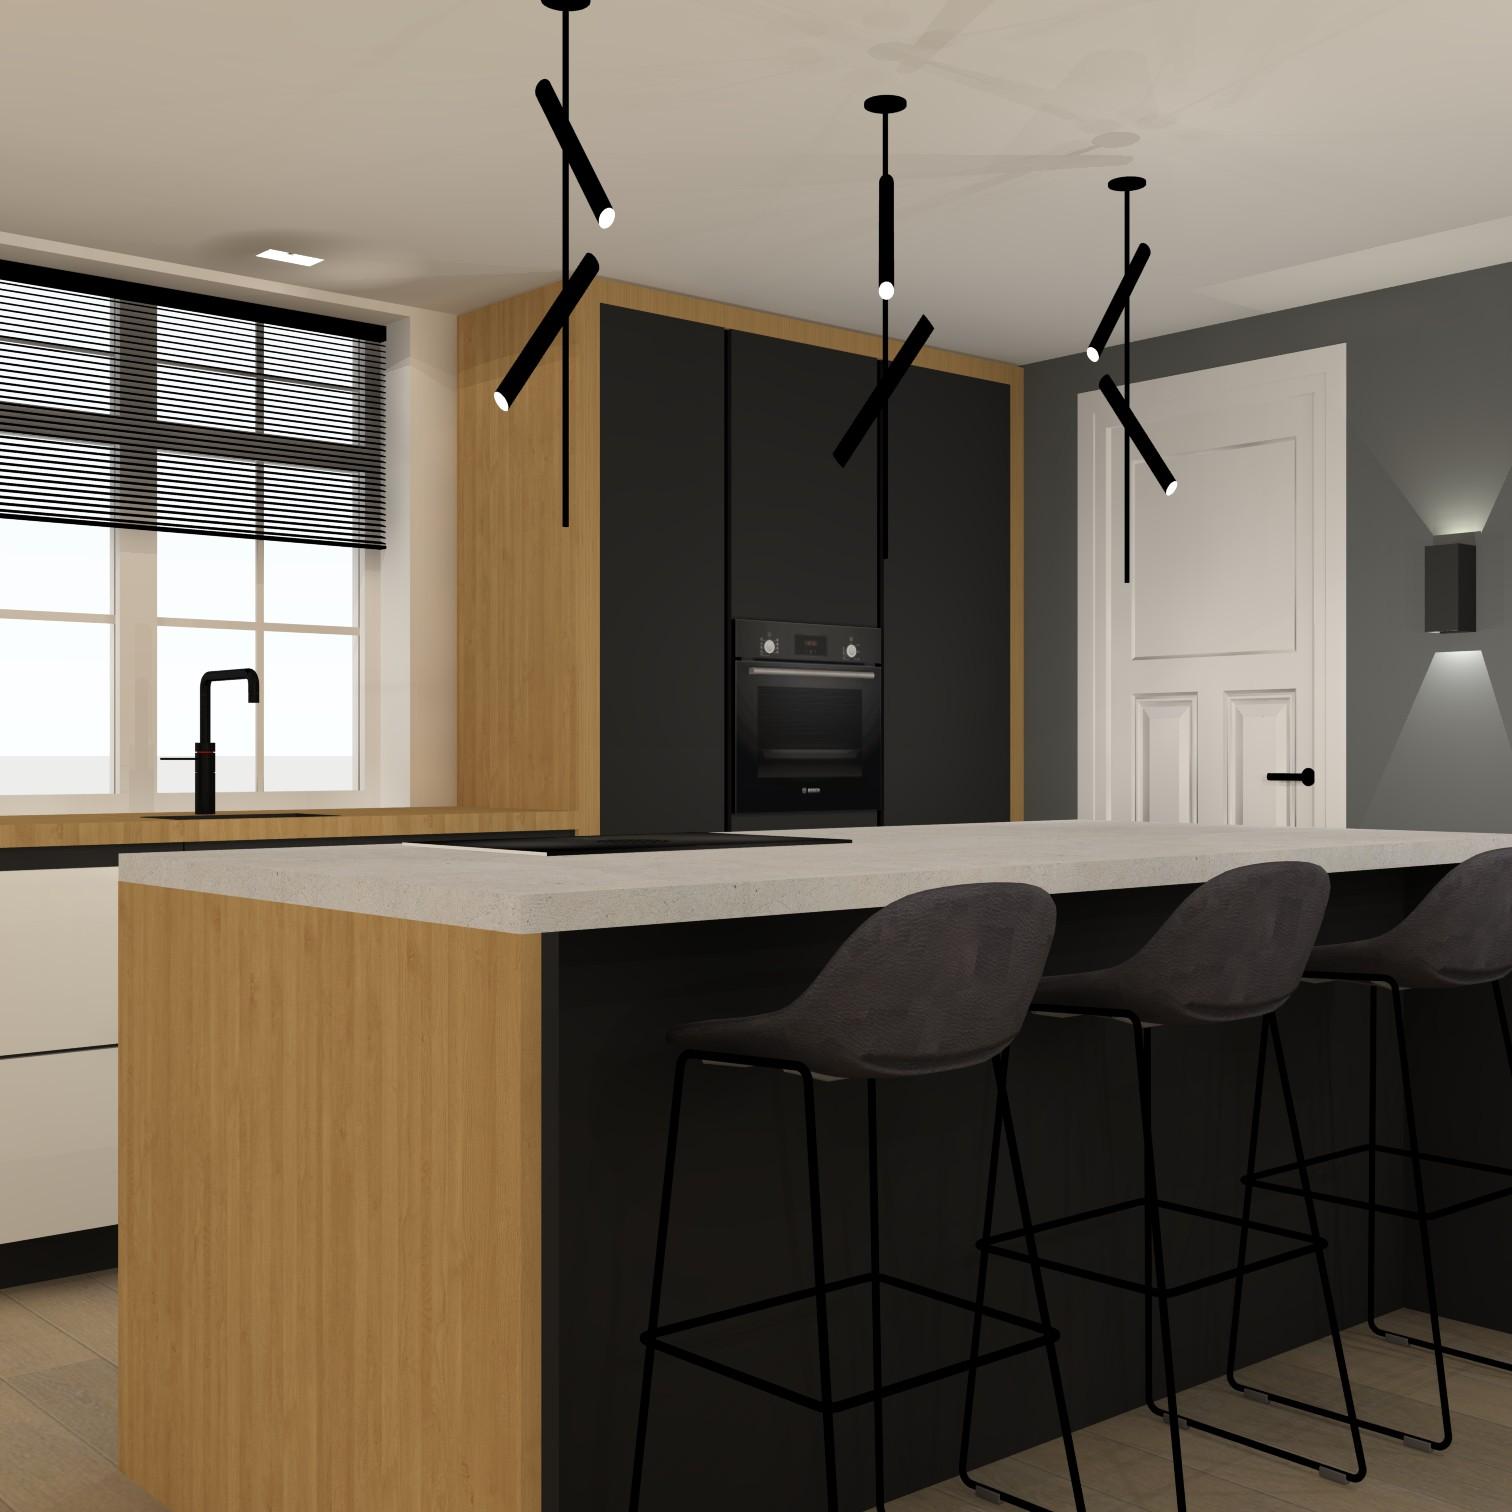 Black,White en wood keuken